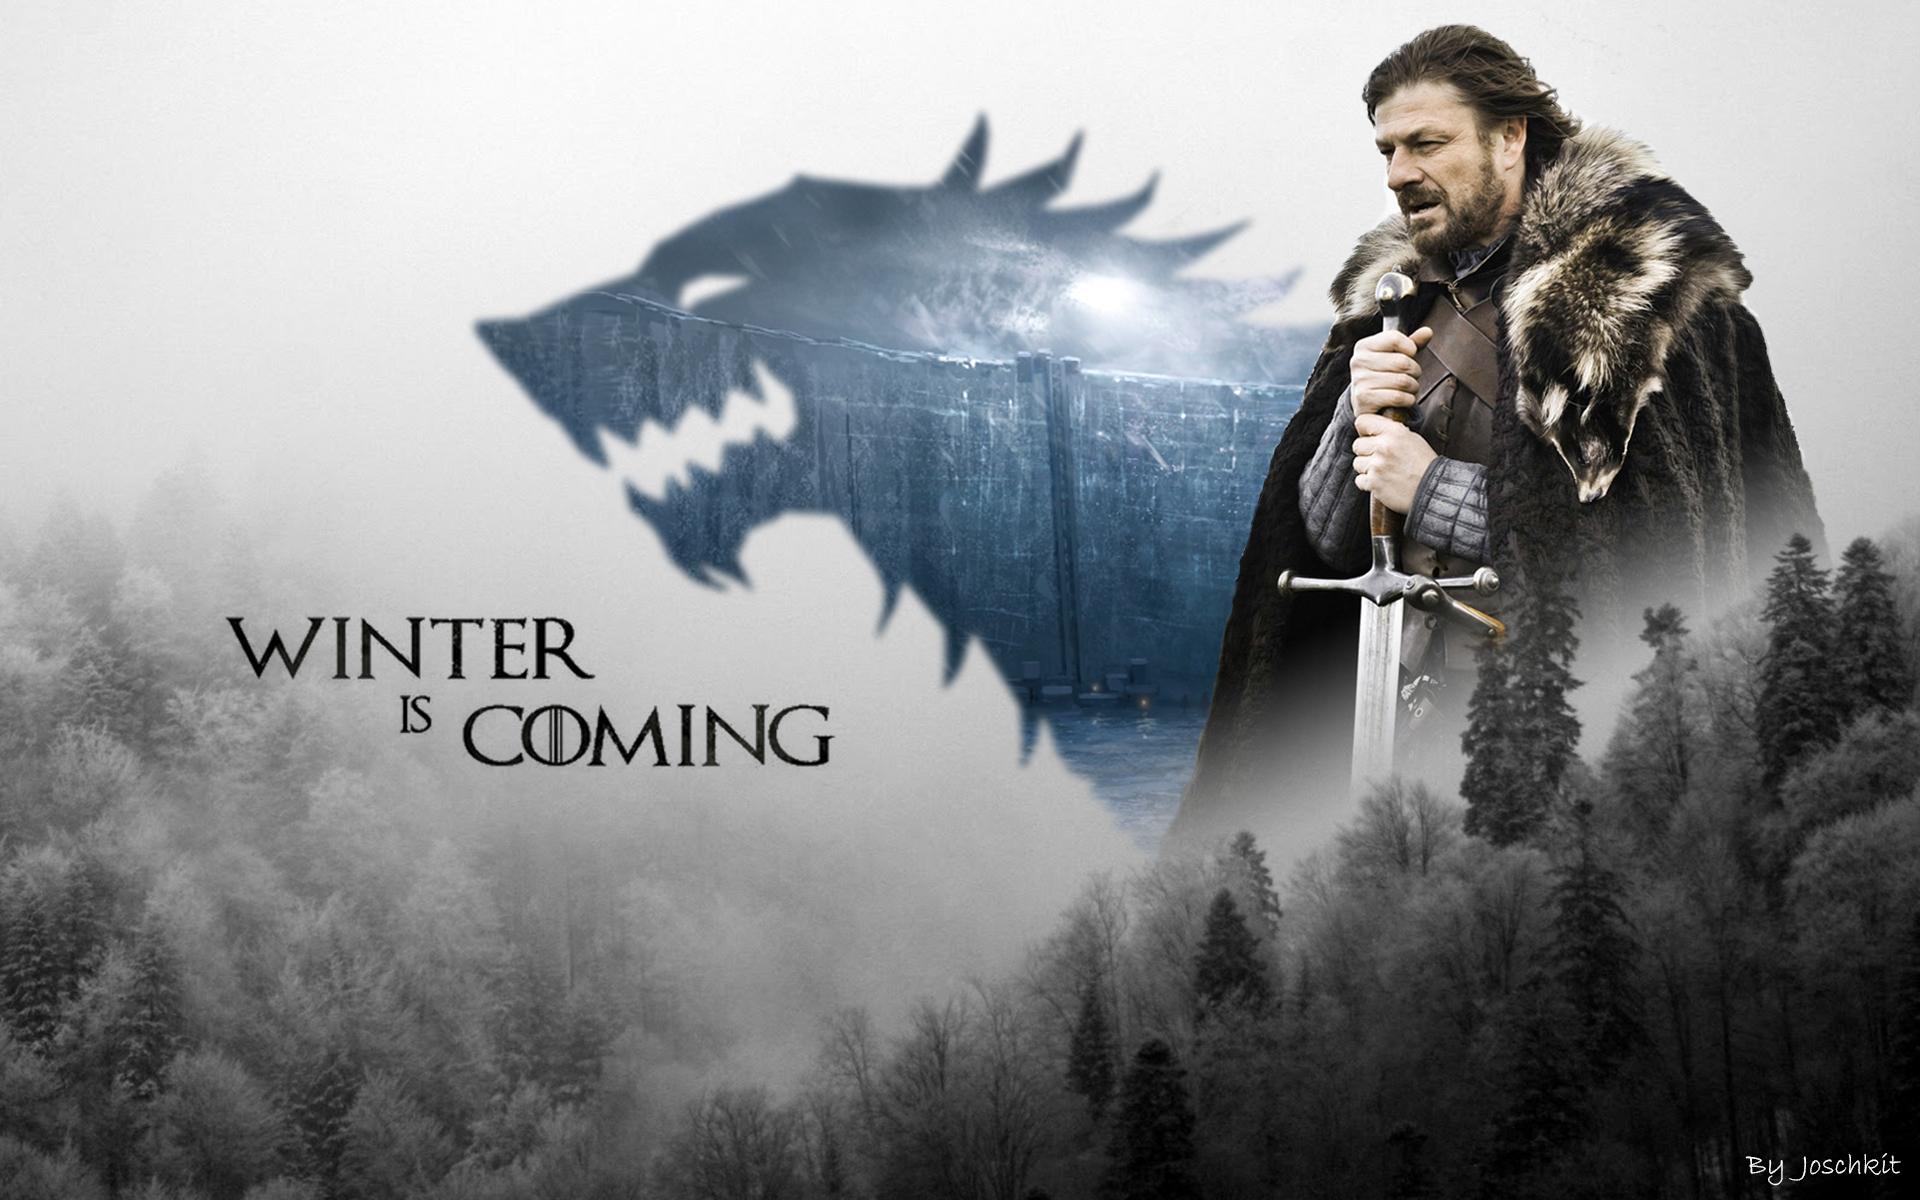 Game of Thrones Wallpaper Eddard Stark by Joschkit on ...